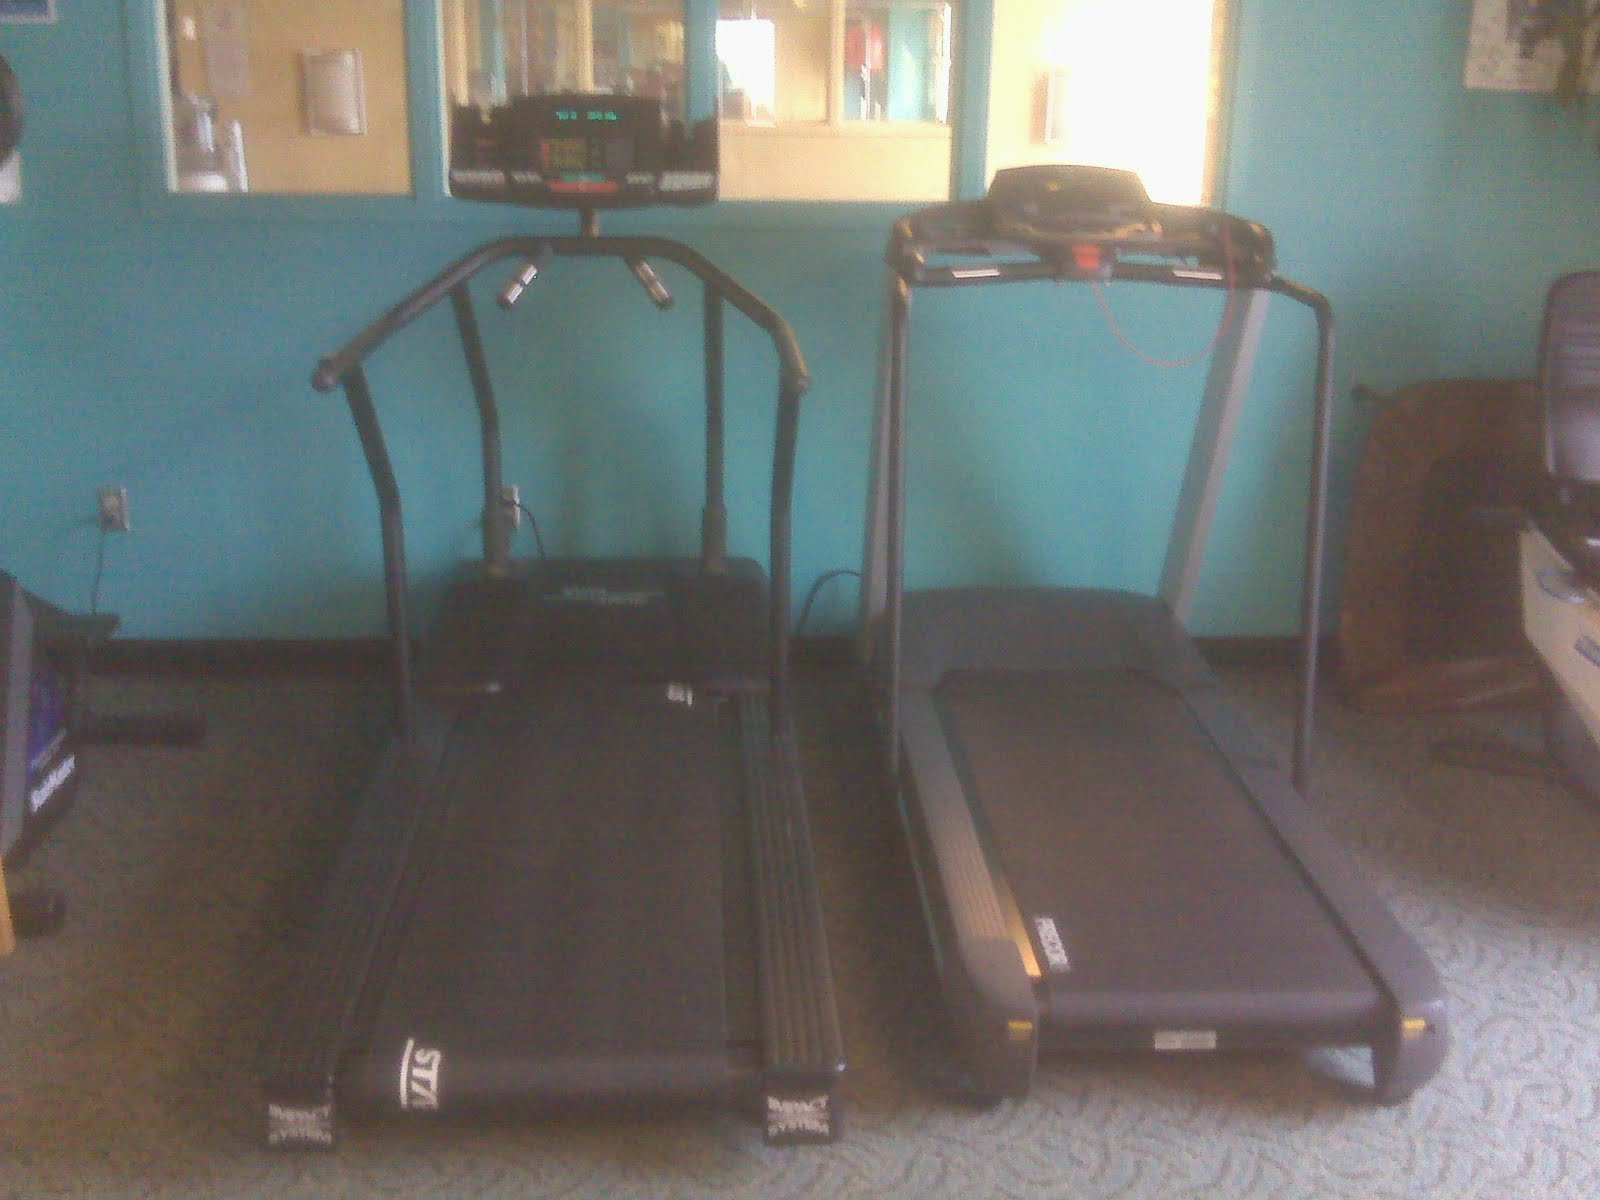 http://4.bp.blogspot.com/_9SunvfZ207Q/TDP-hOyC37I/AAAAAAAAAZA/1LKfnosqi7M/s1600/Treadmill.bmp